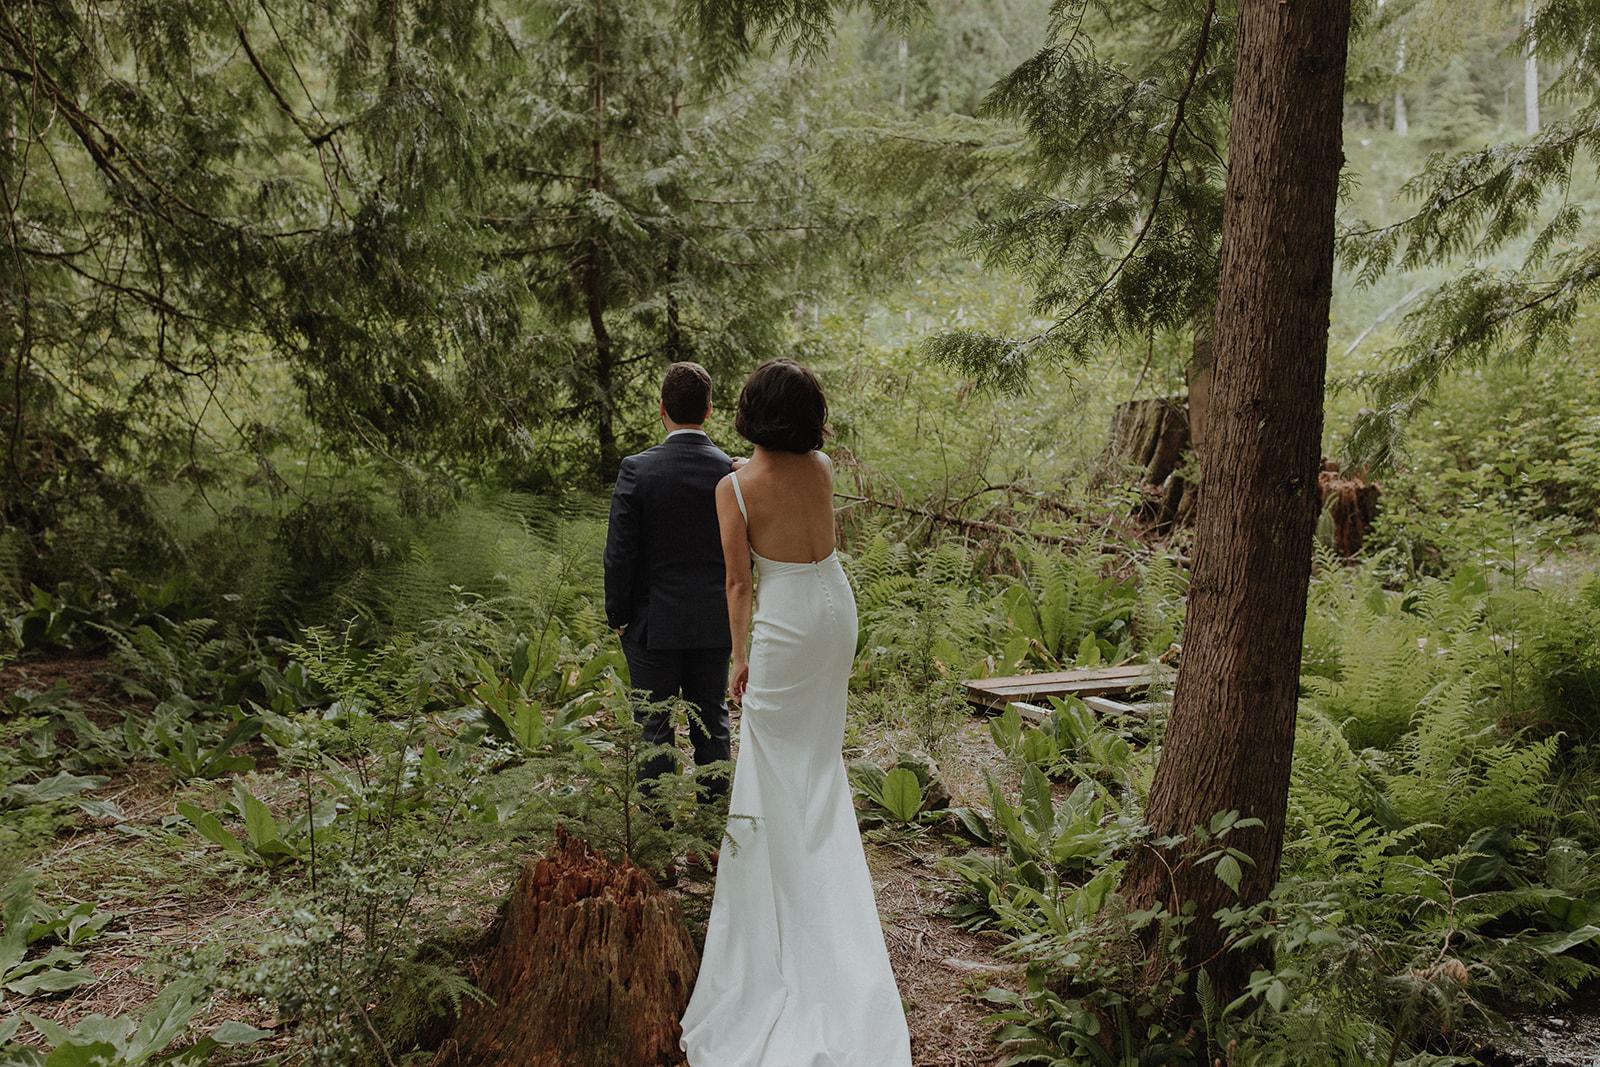 cortney_skye_wedding_june2019-68.jpg